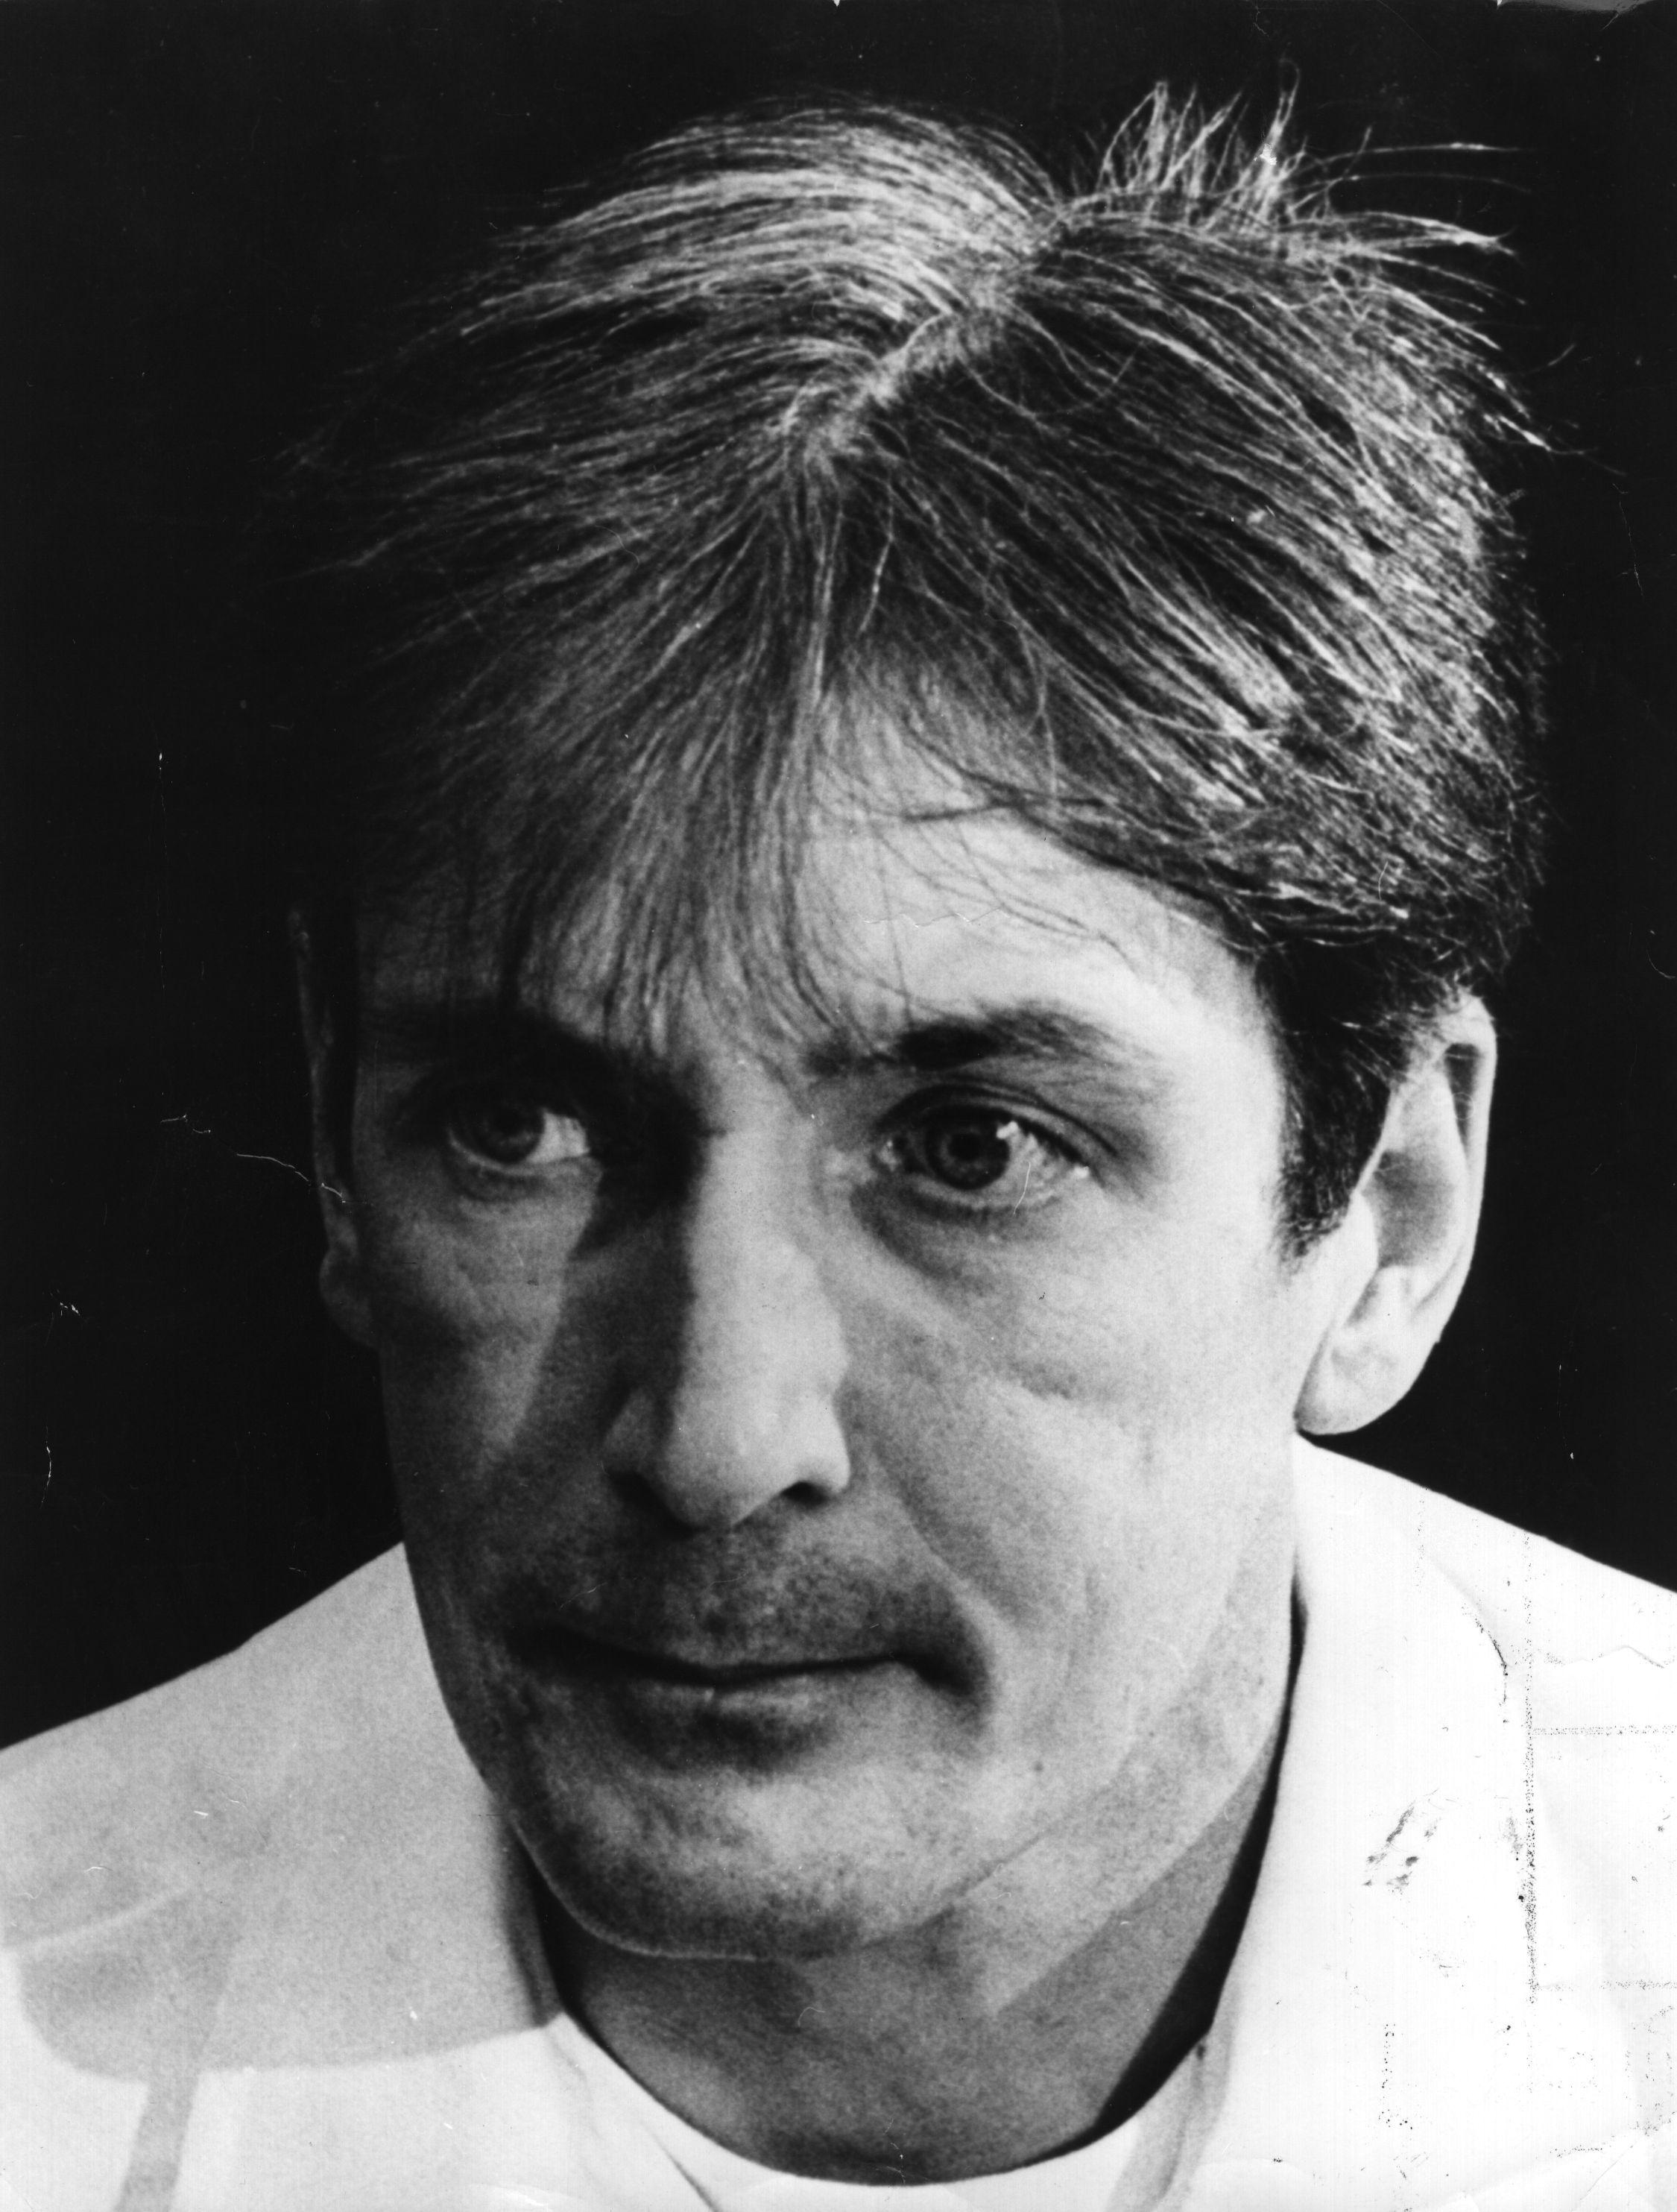 Gary Gilmore asesino que inspiró el just do it de nike